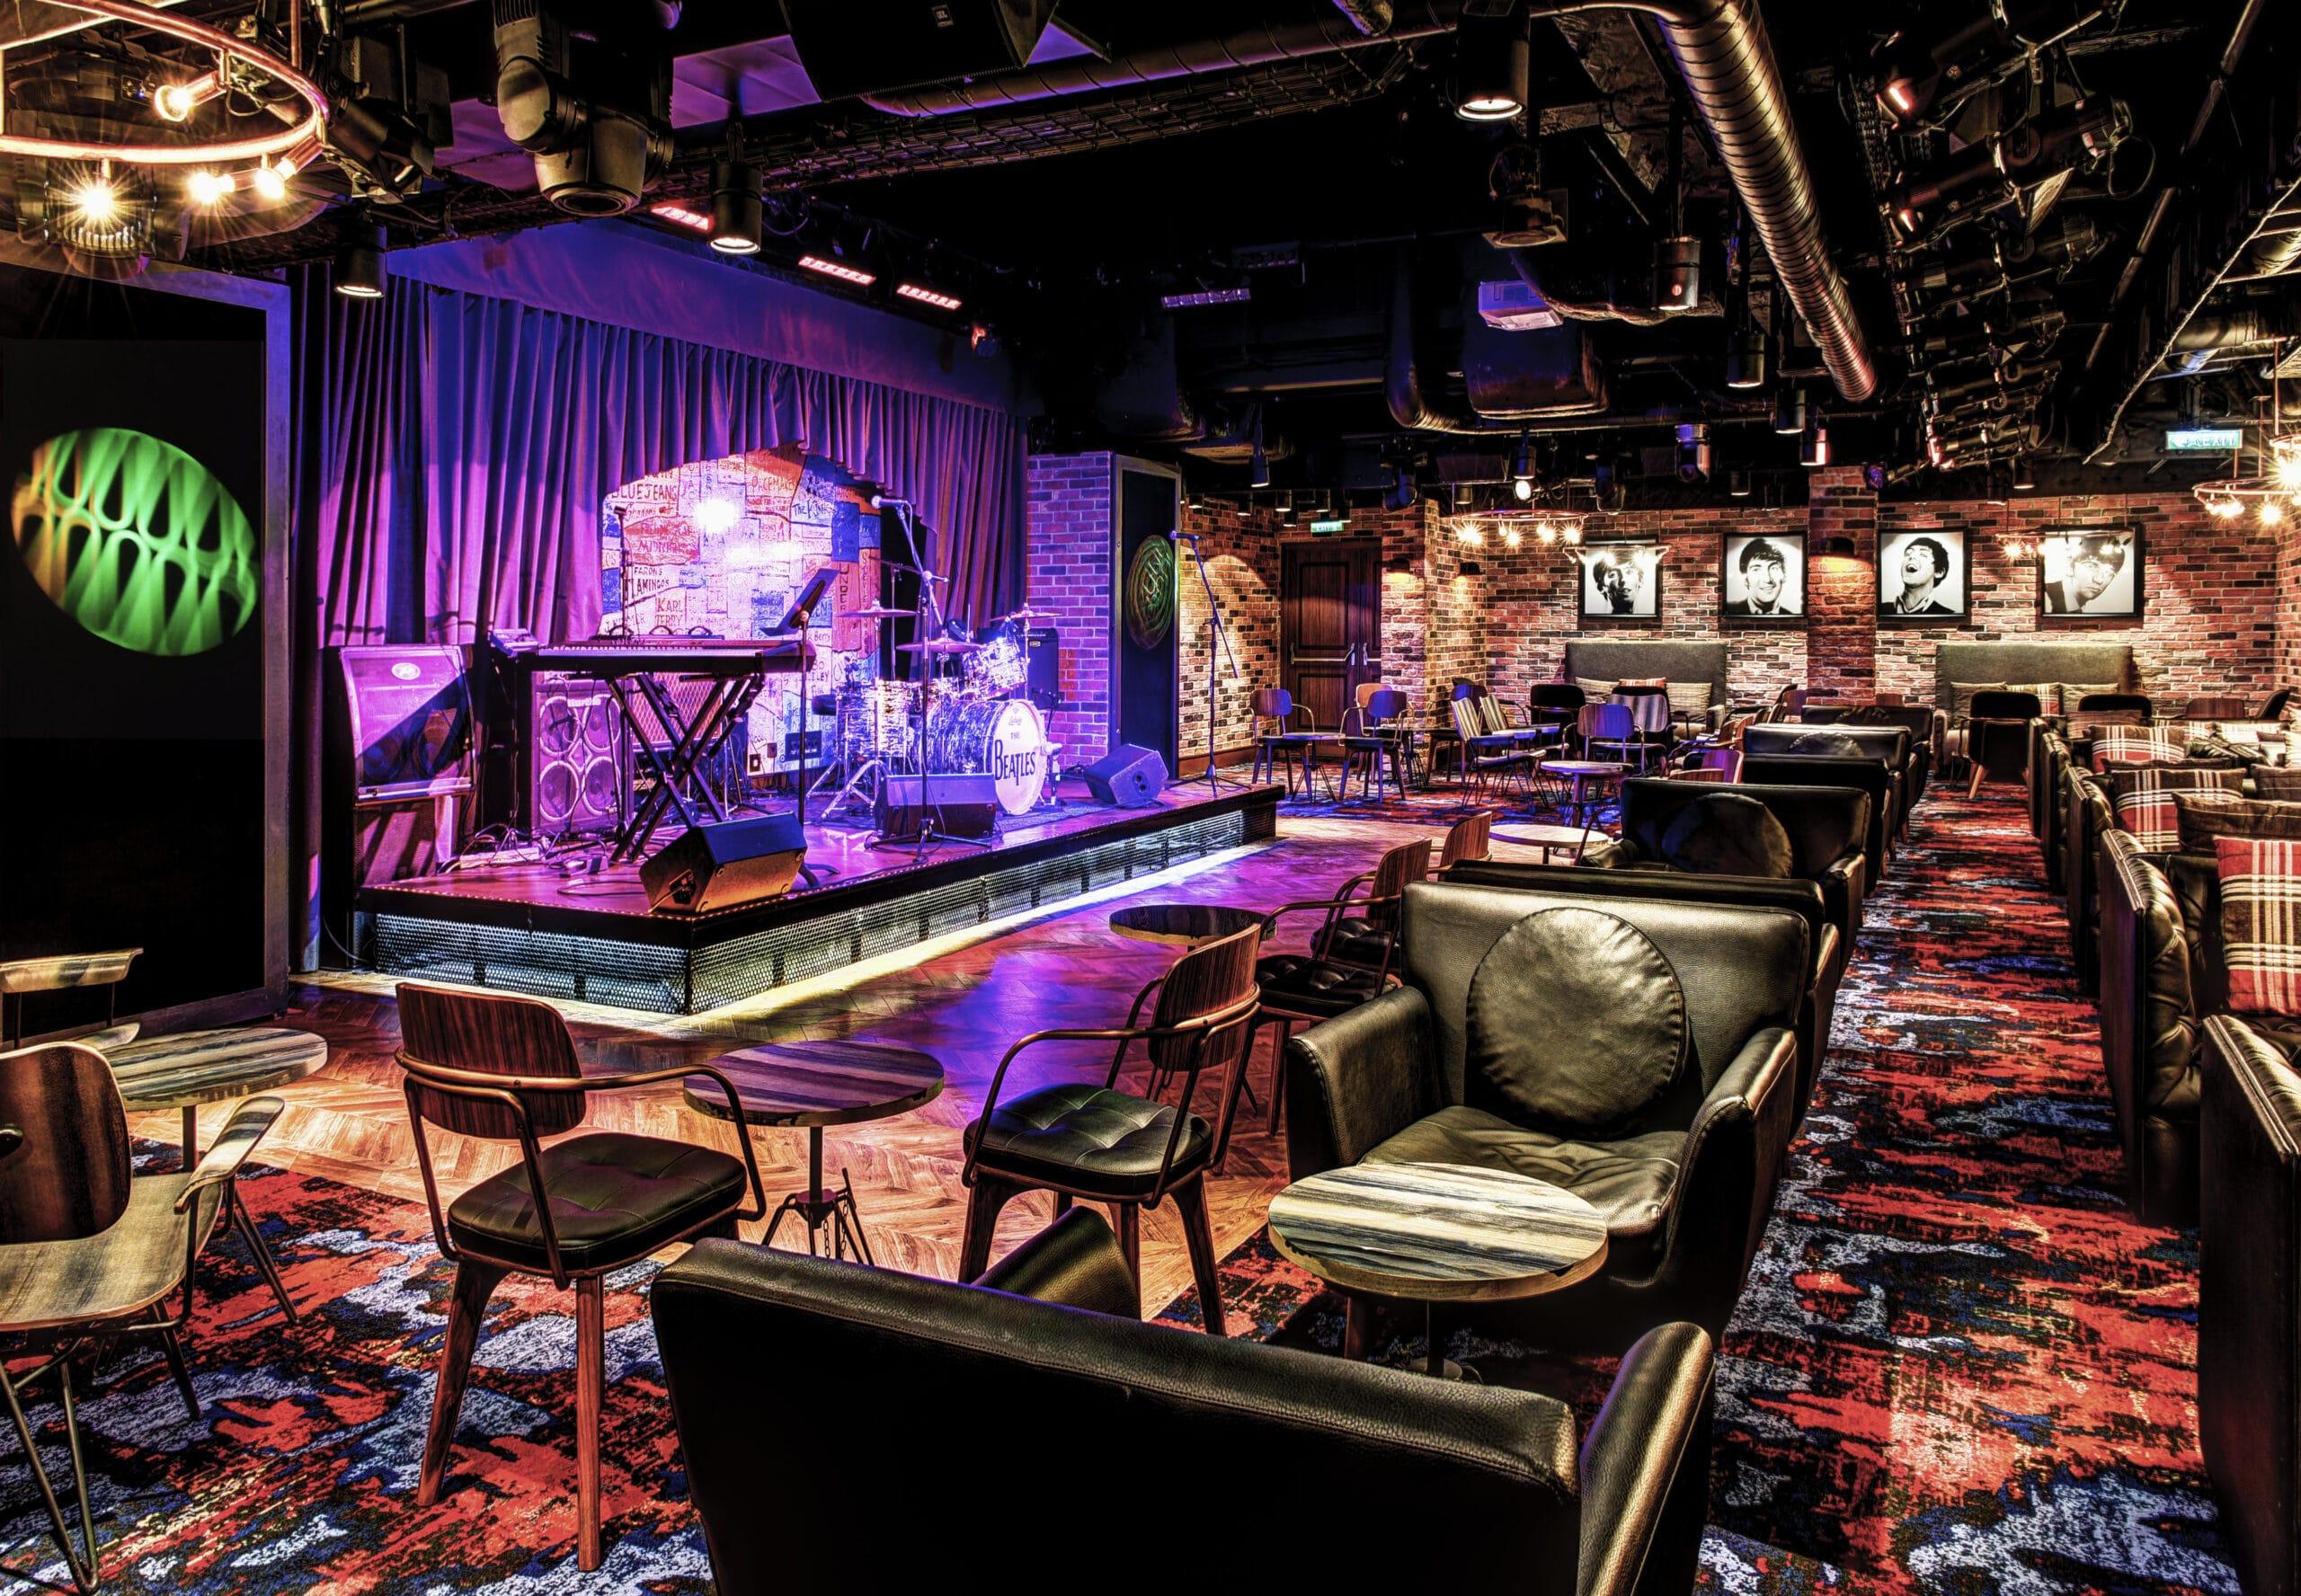 Cruiseschip-Norwegian Epic-Norwegian Cruise Line-The Cavern Club